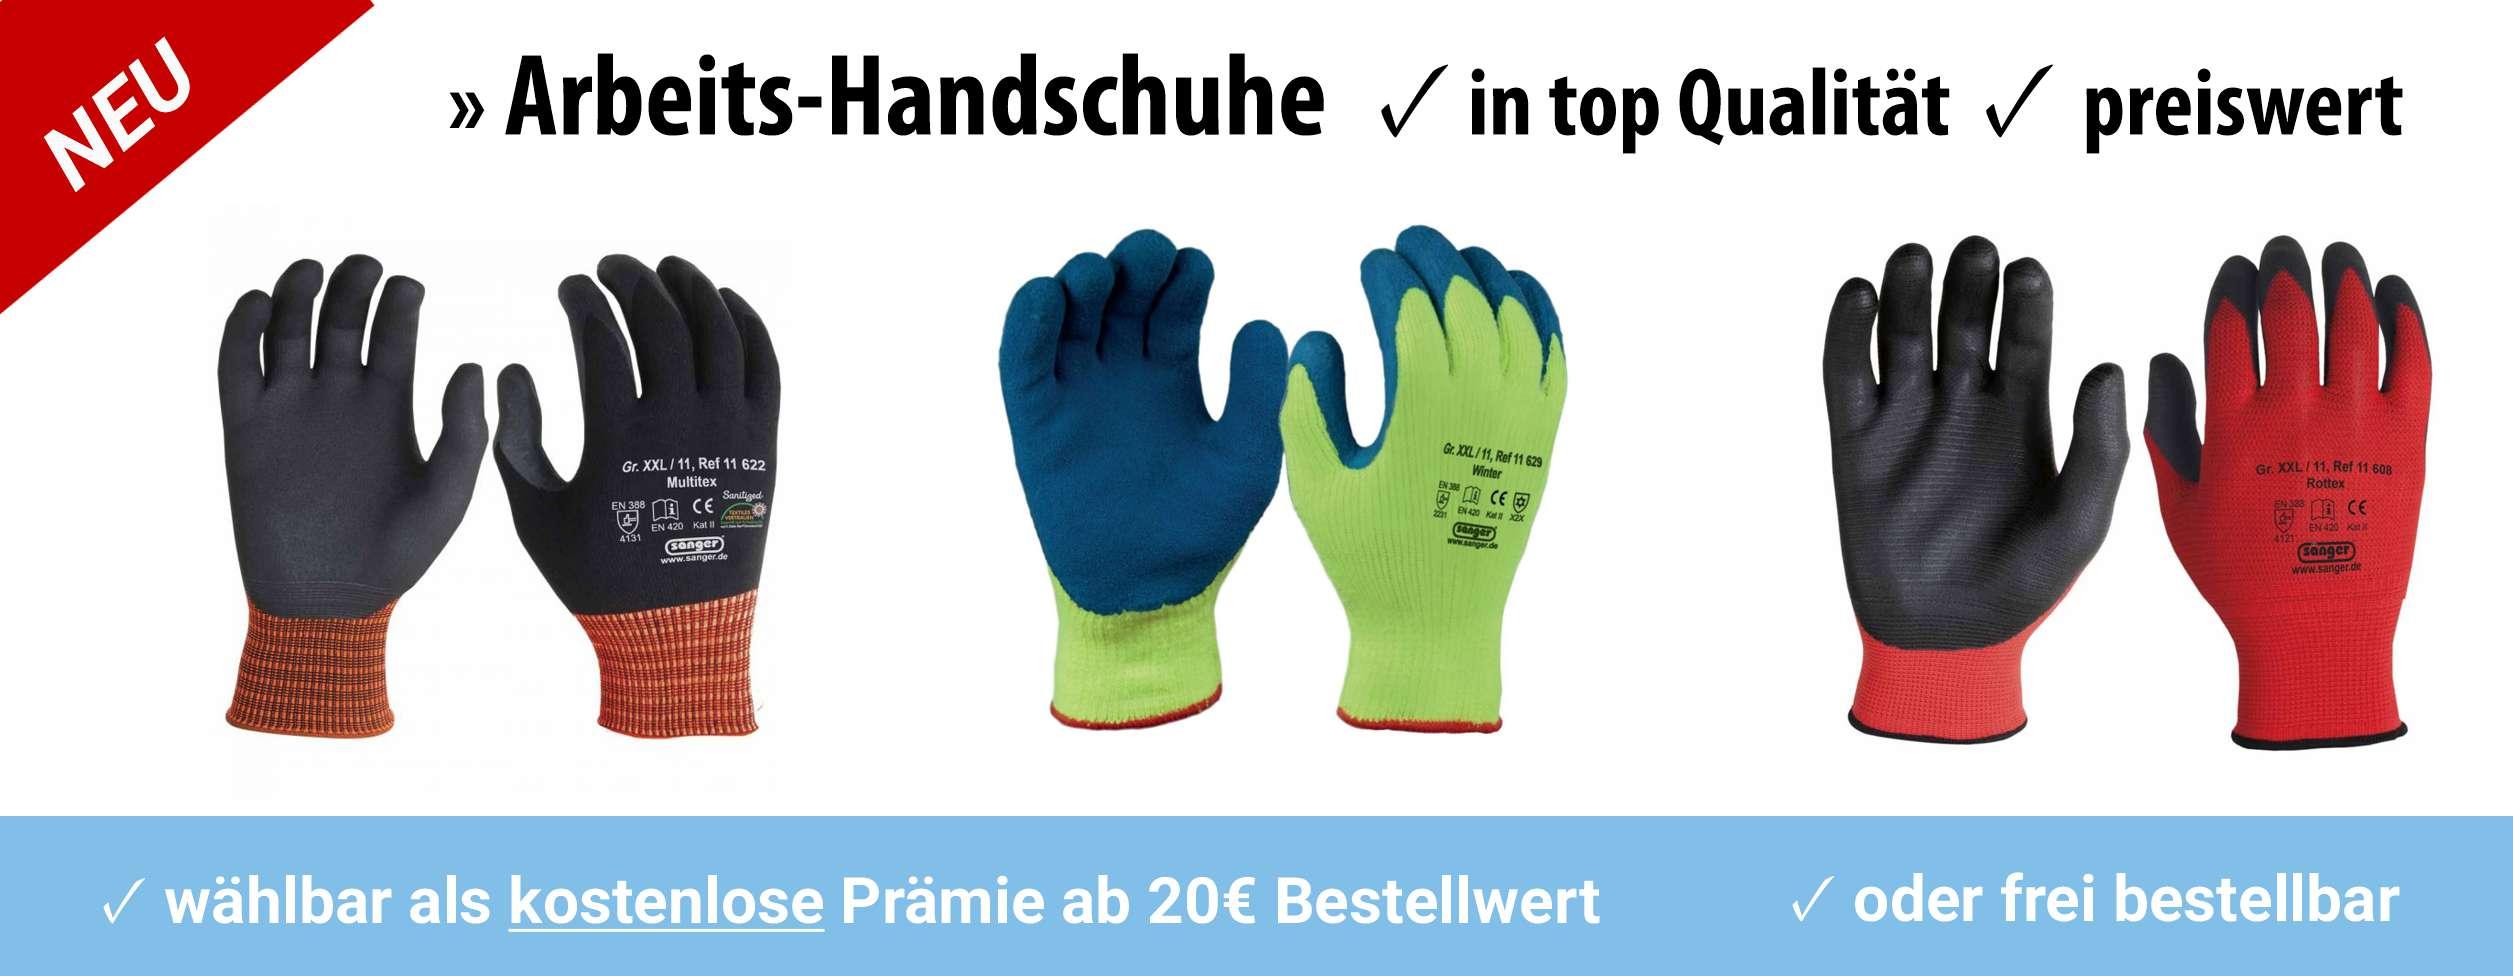 robuste Arbeits-Handschuhe